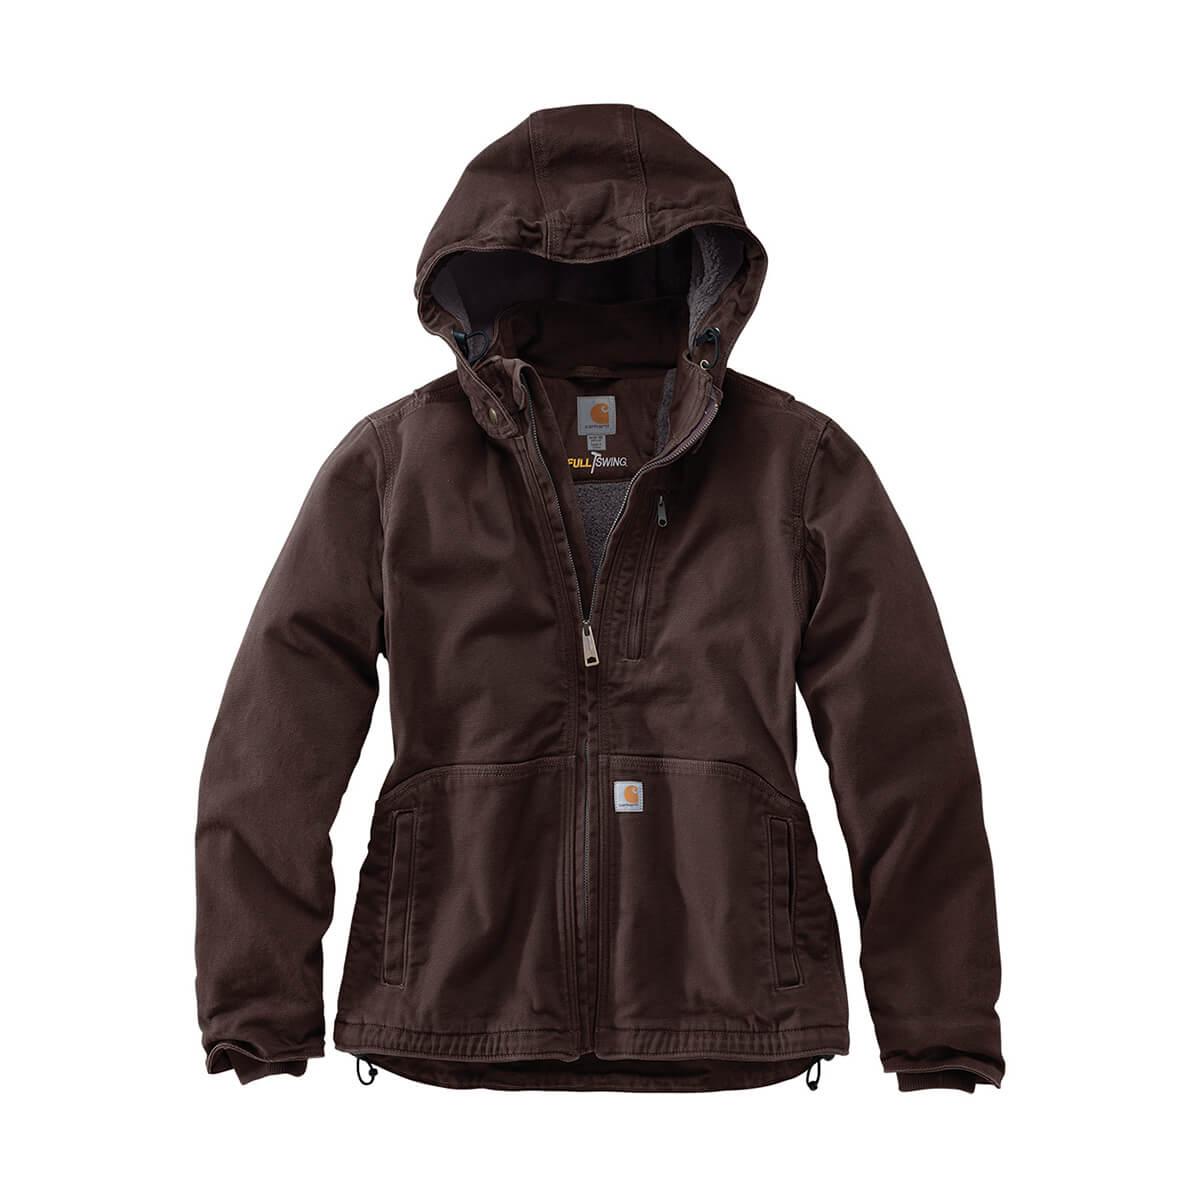 Carhartt Full Swing® Caldwell Jacket - Dark Brown